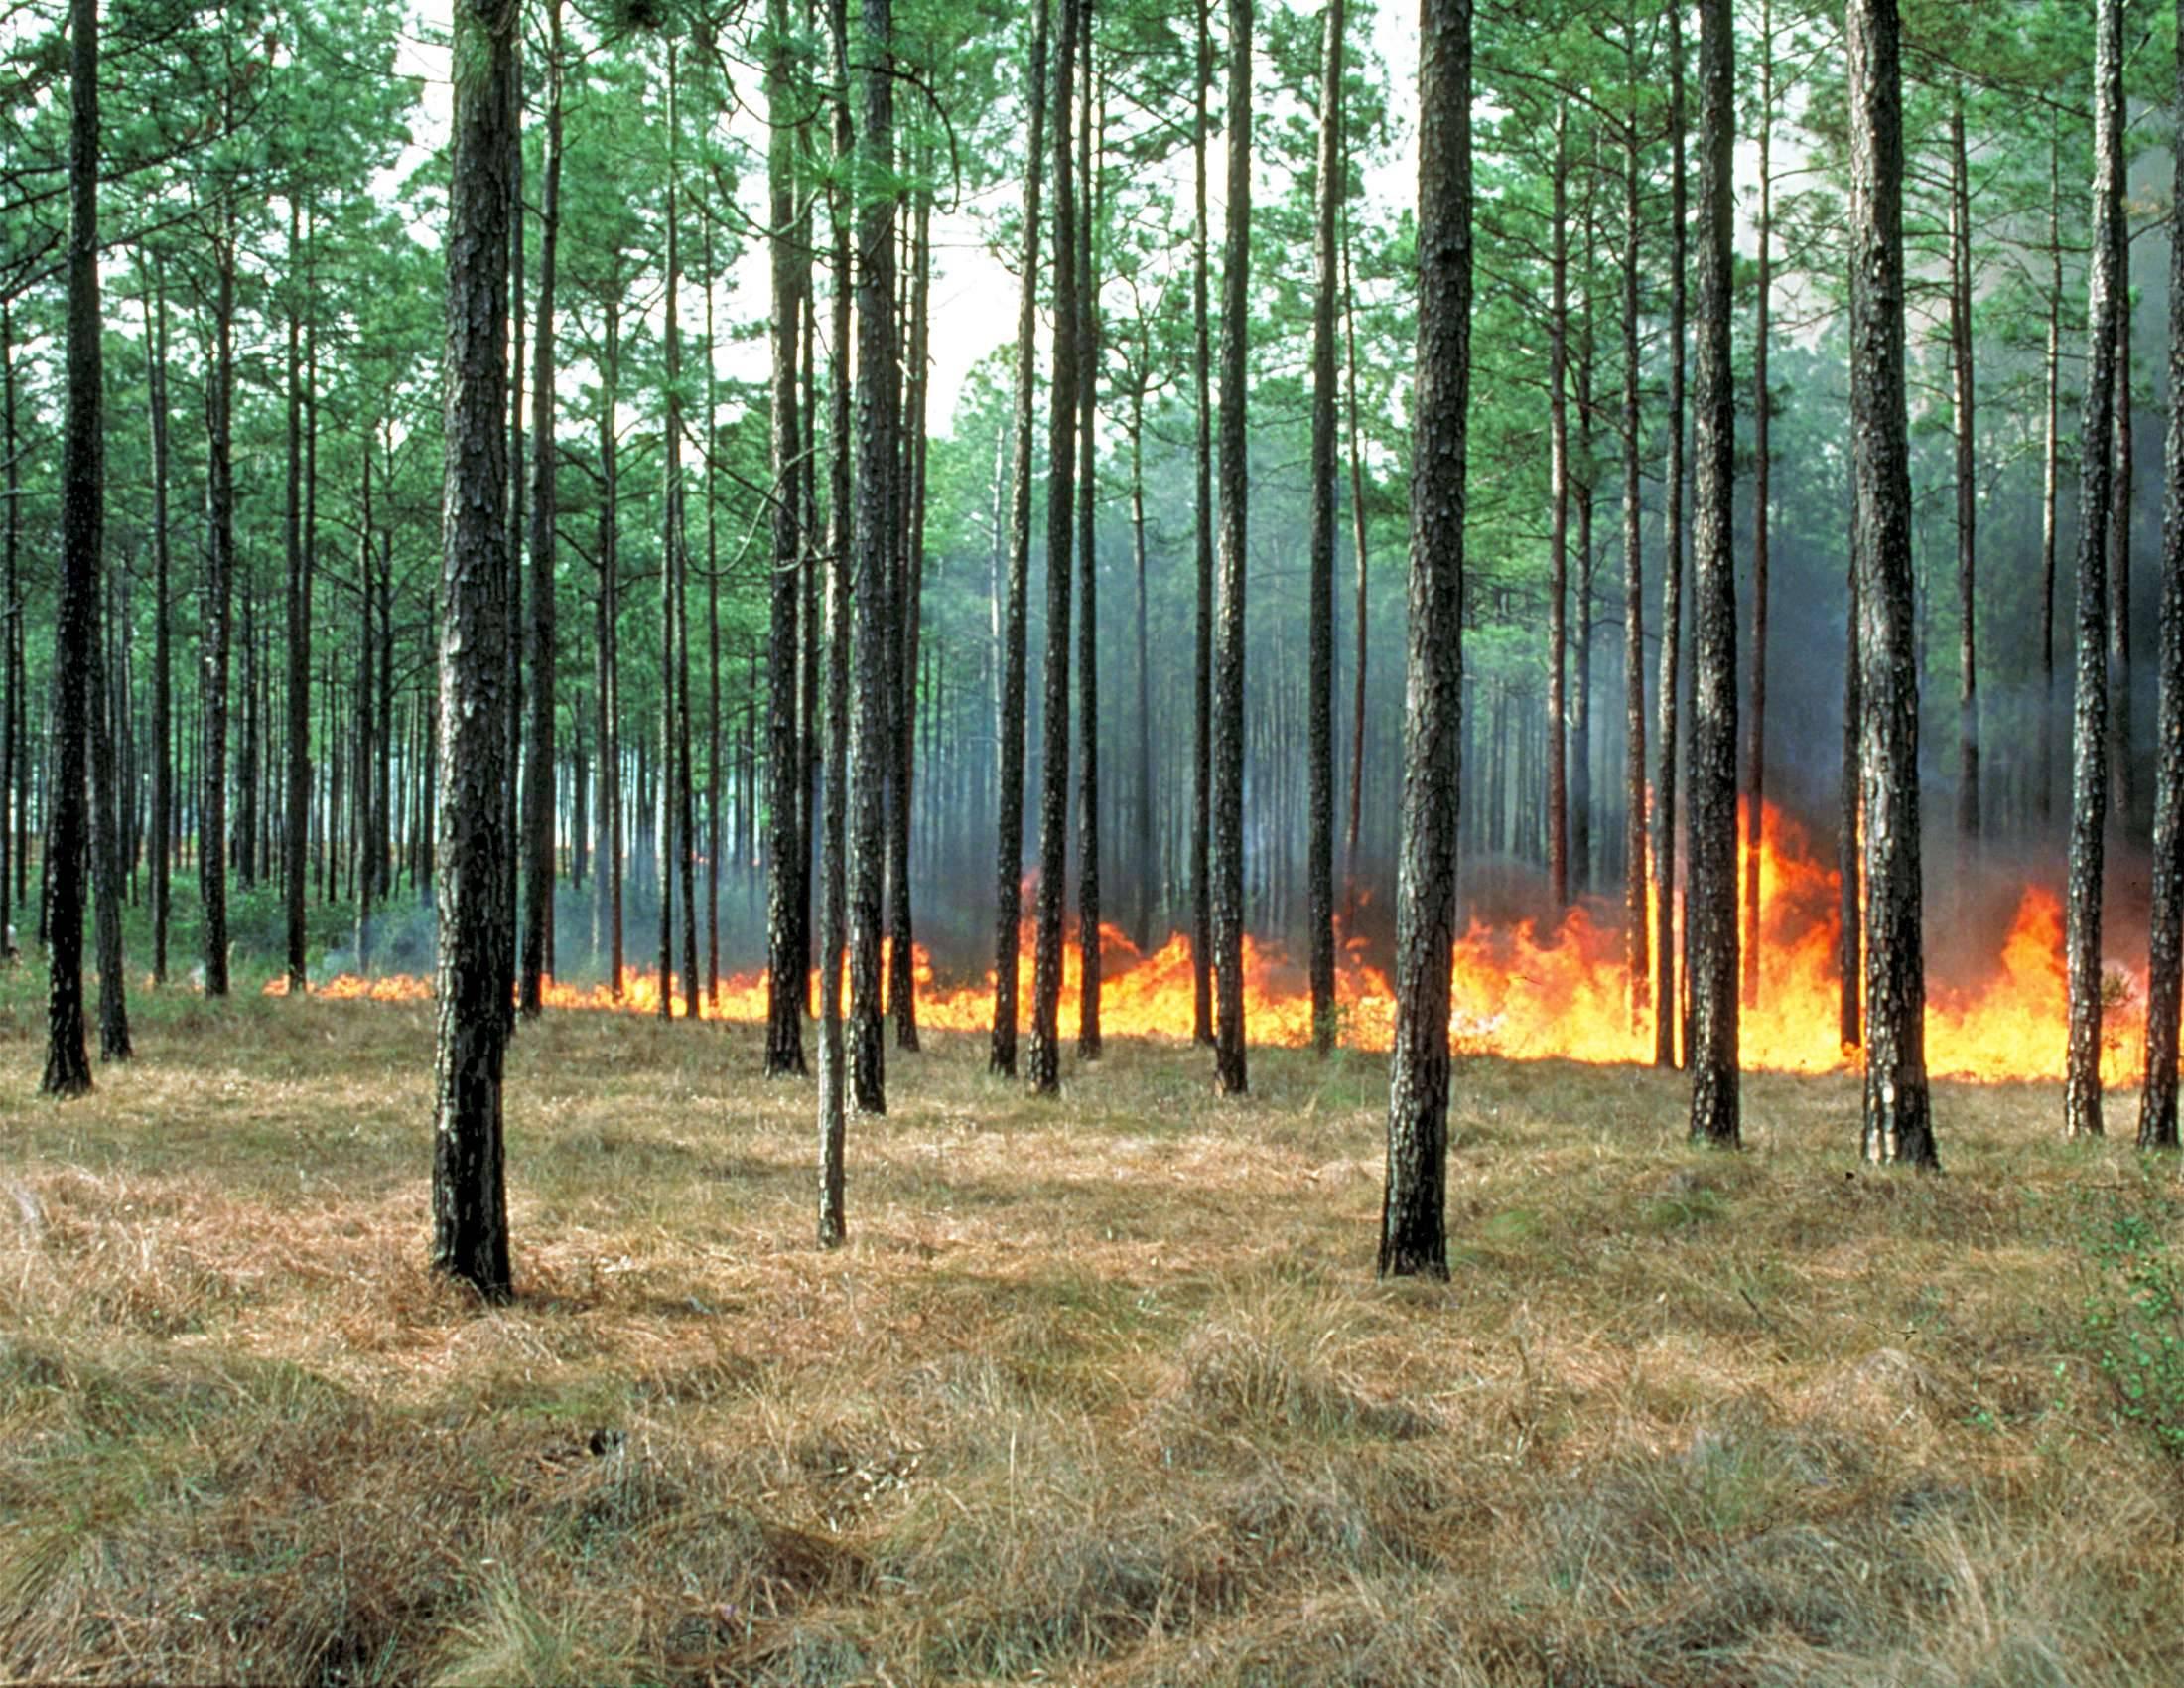 Photograph of a prescribed burn in South Georgia.